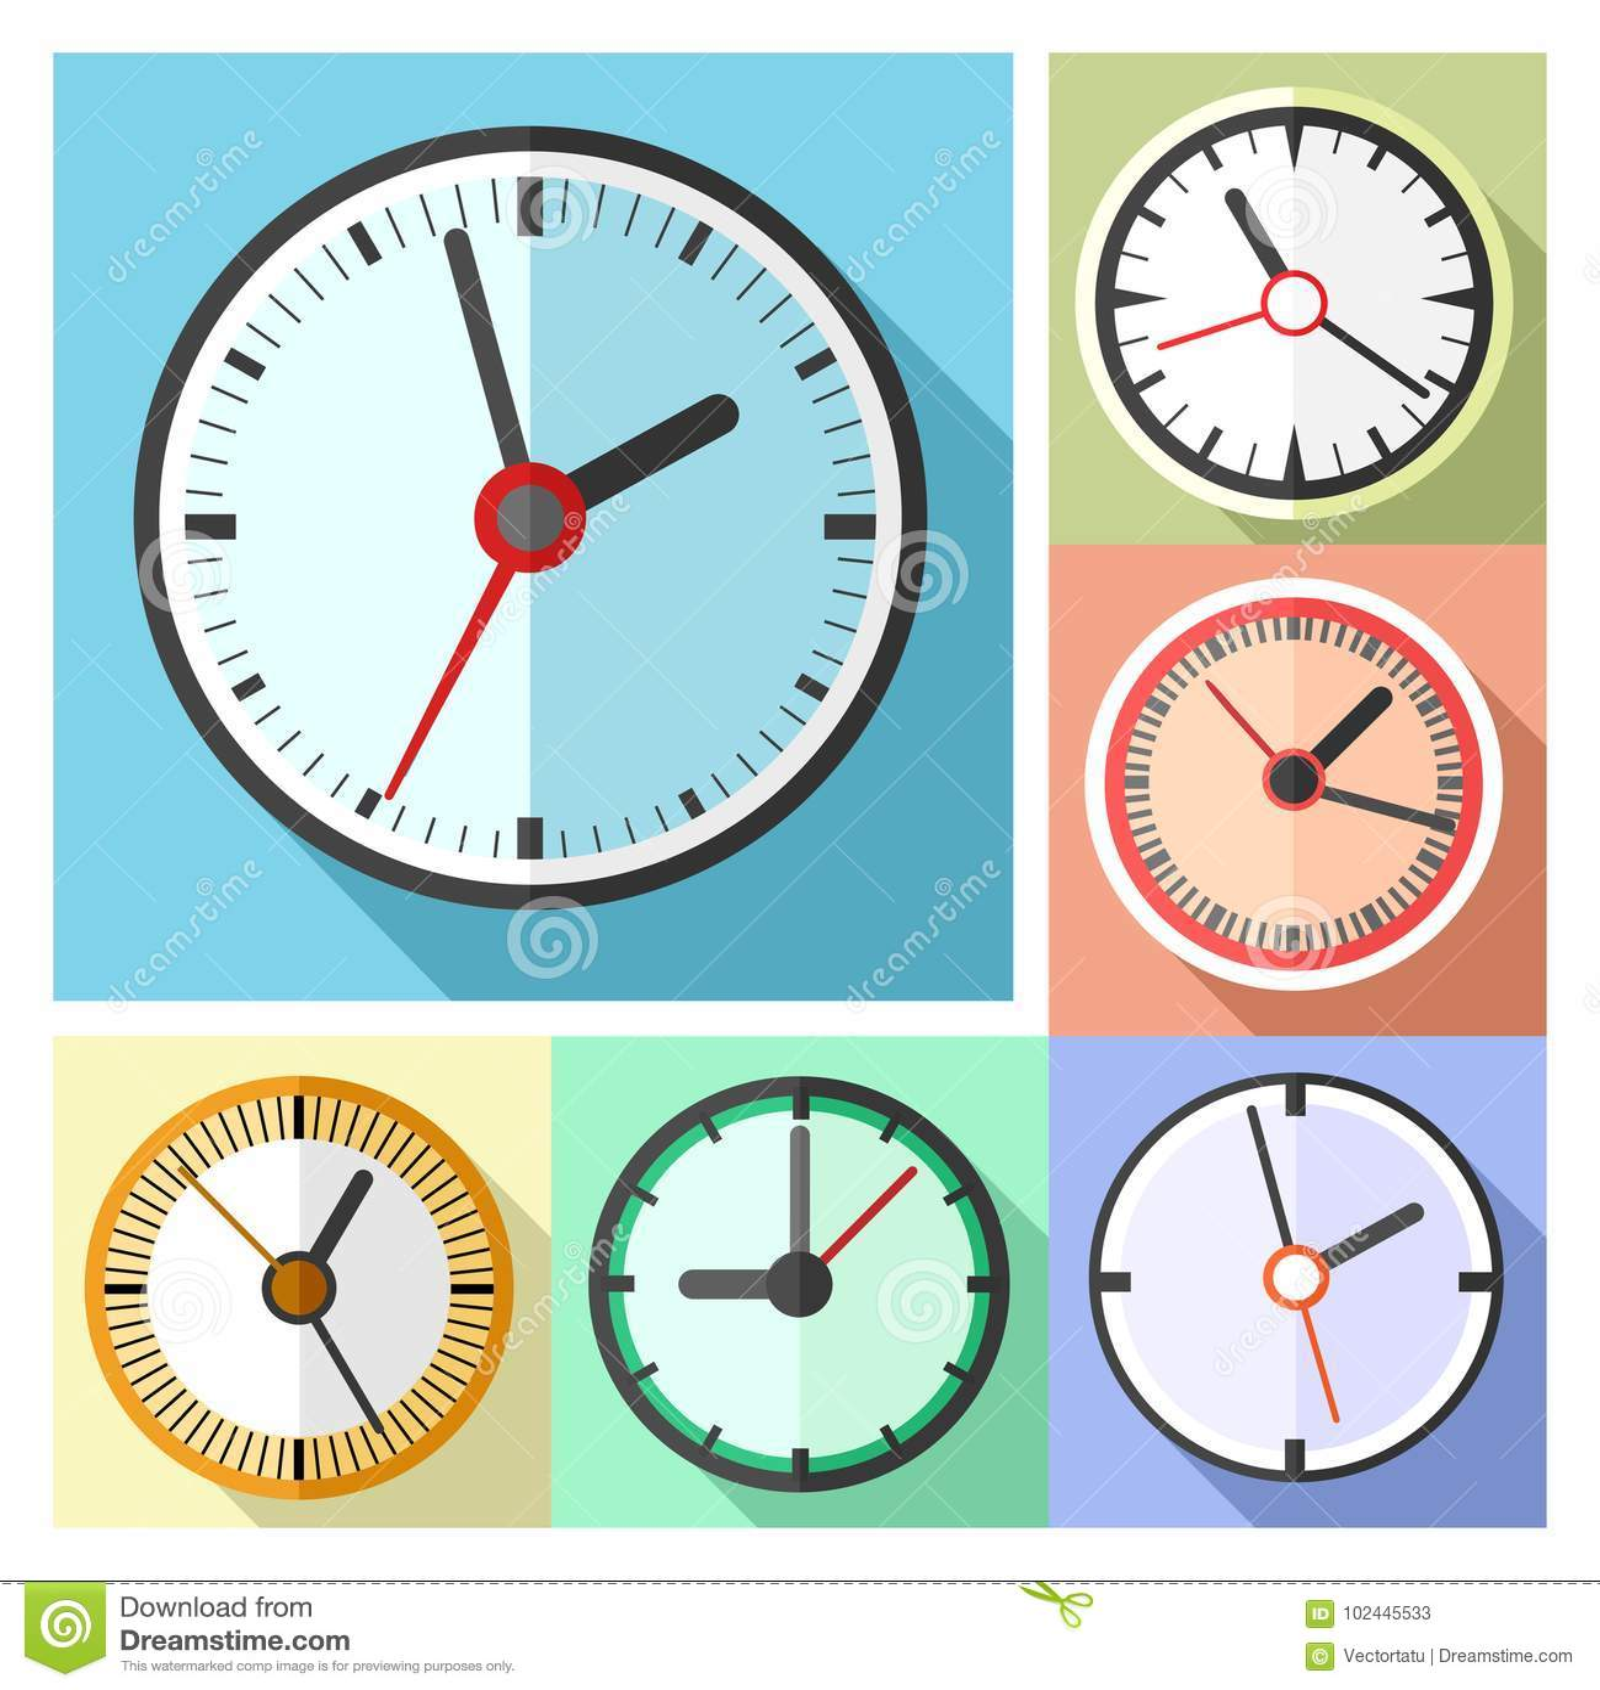 wall clocks for office. Office Wall Clocks. Modern Clocks Icon Set W For